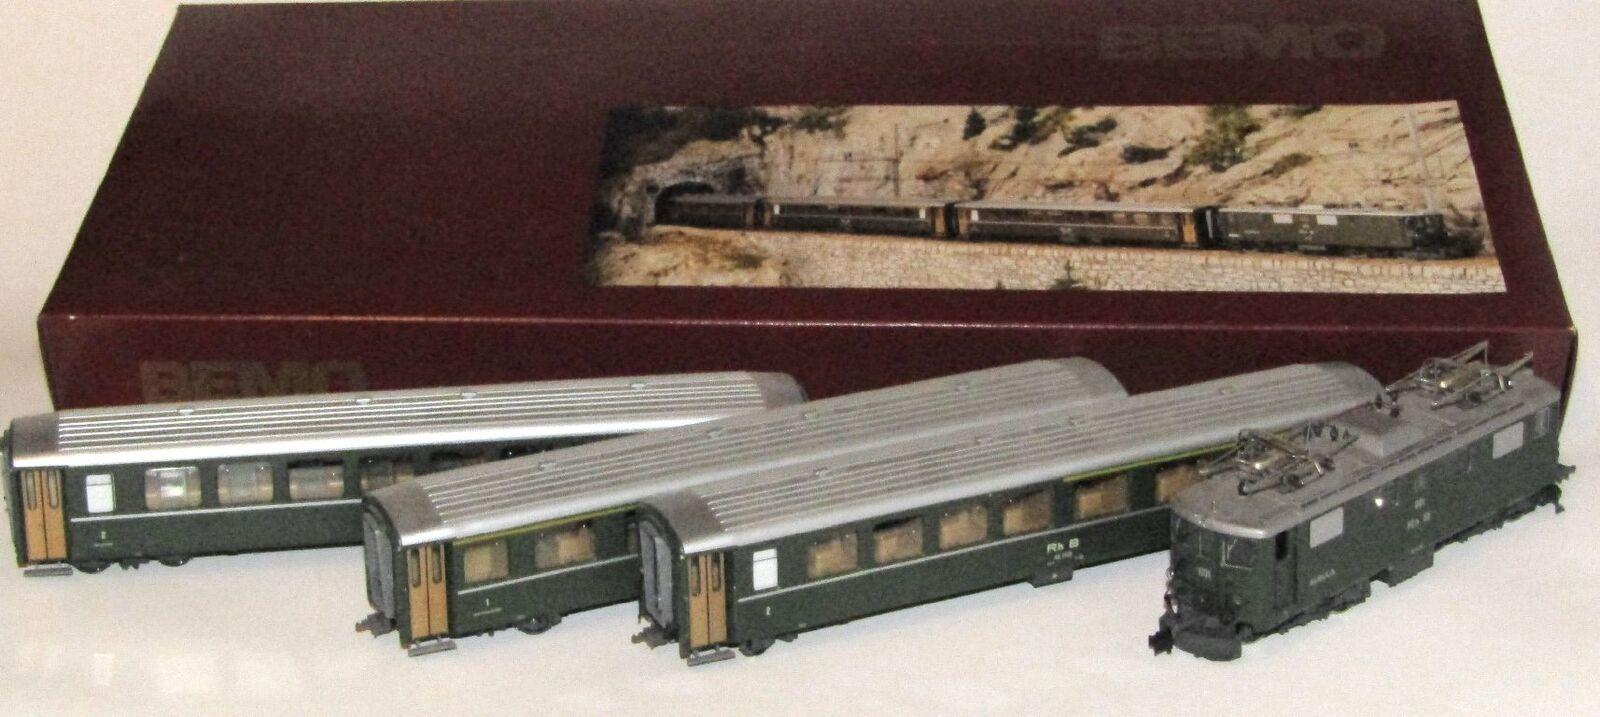 BEMO treno rapido-Set Rhätische Bahn M. ge 4 4, 4, 4, h0m, analogico, art.7215 100, OVP fec0b6